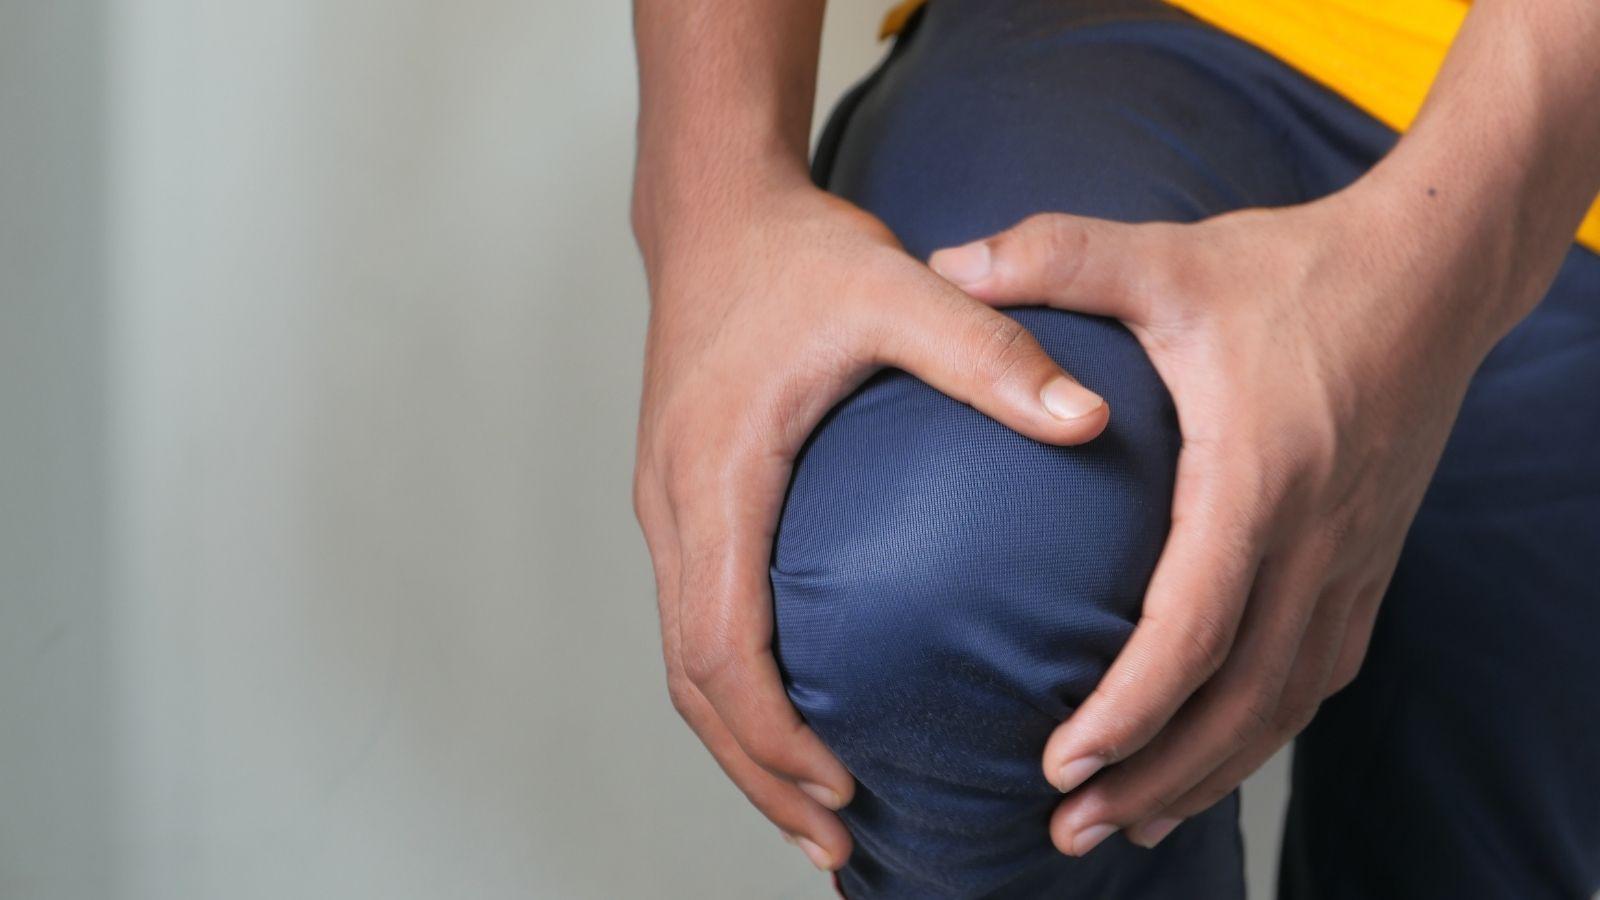 Diagnosis of the osteoarthritis